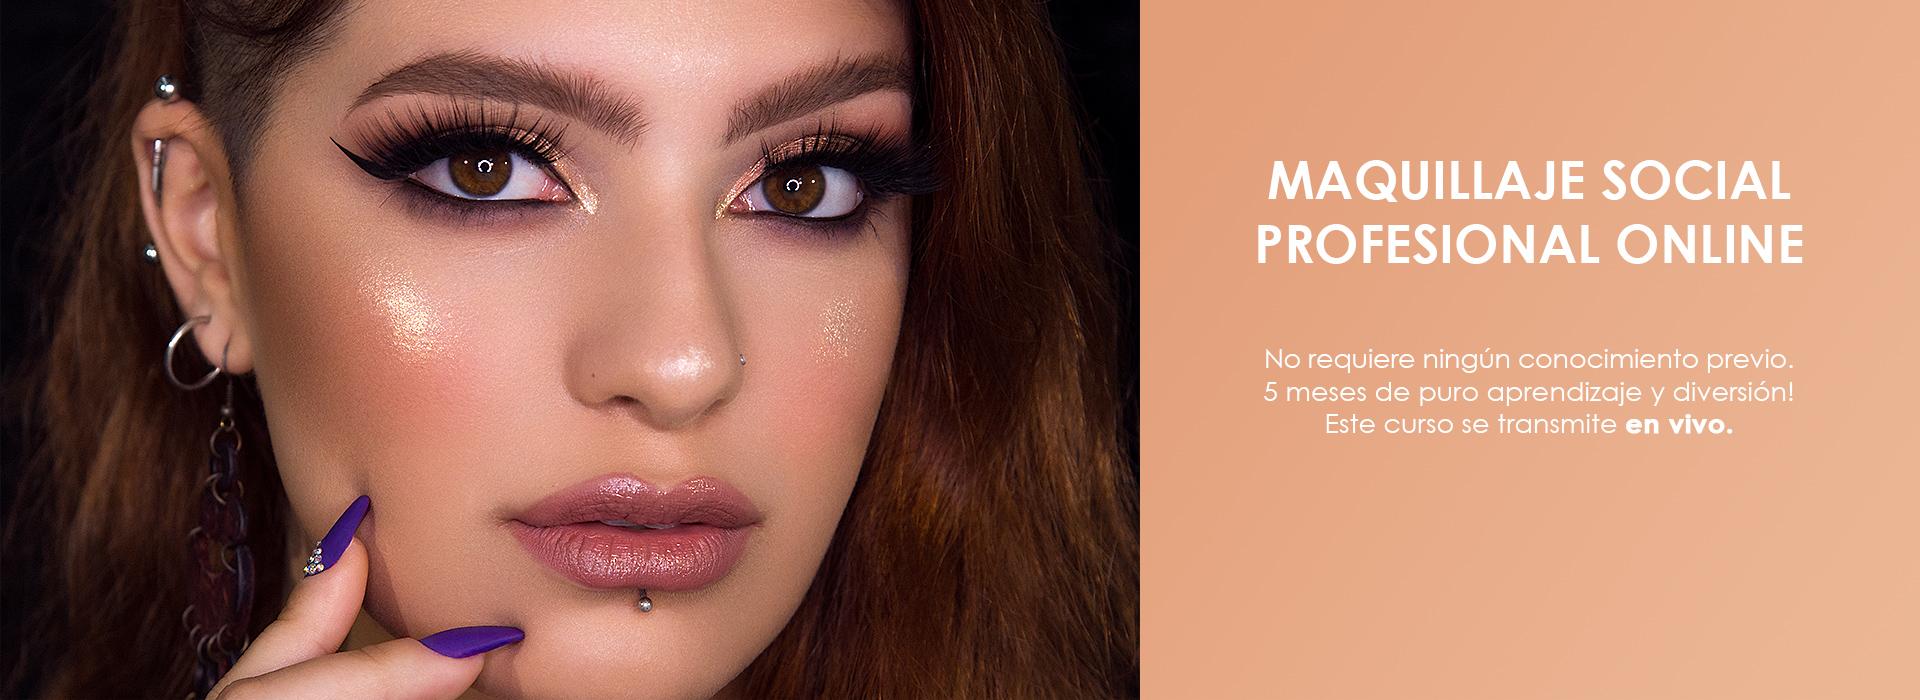 Curso de Maquillaje Social Profesional Online